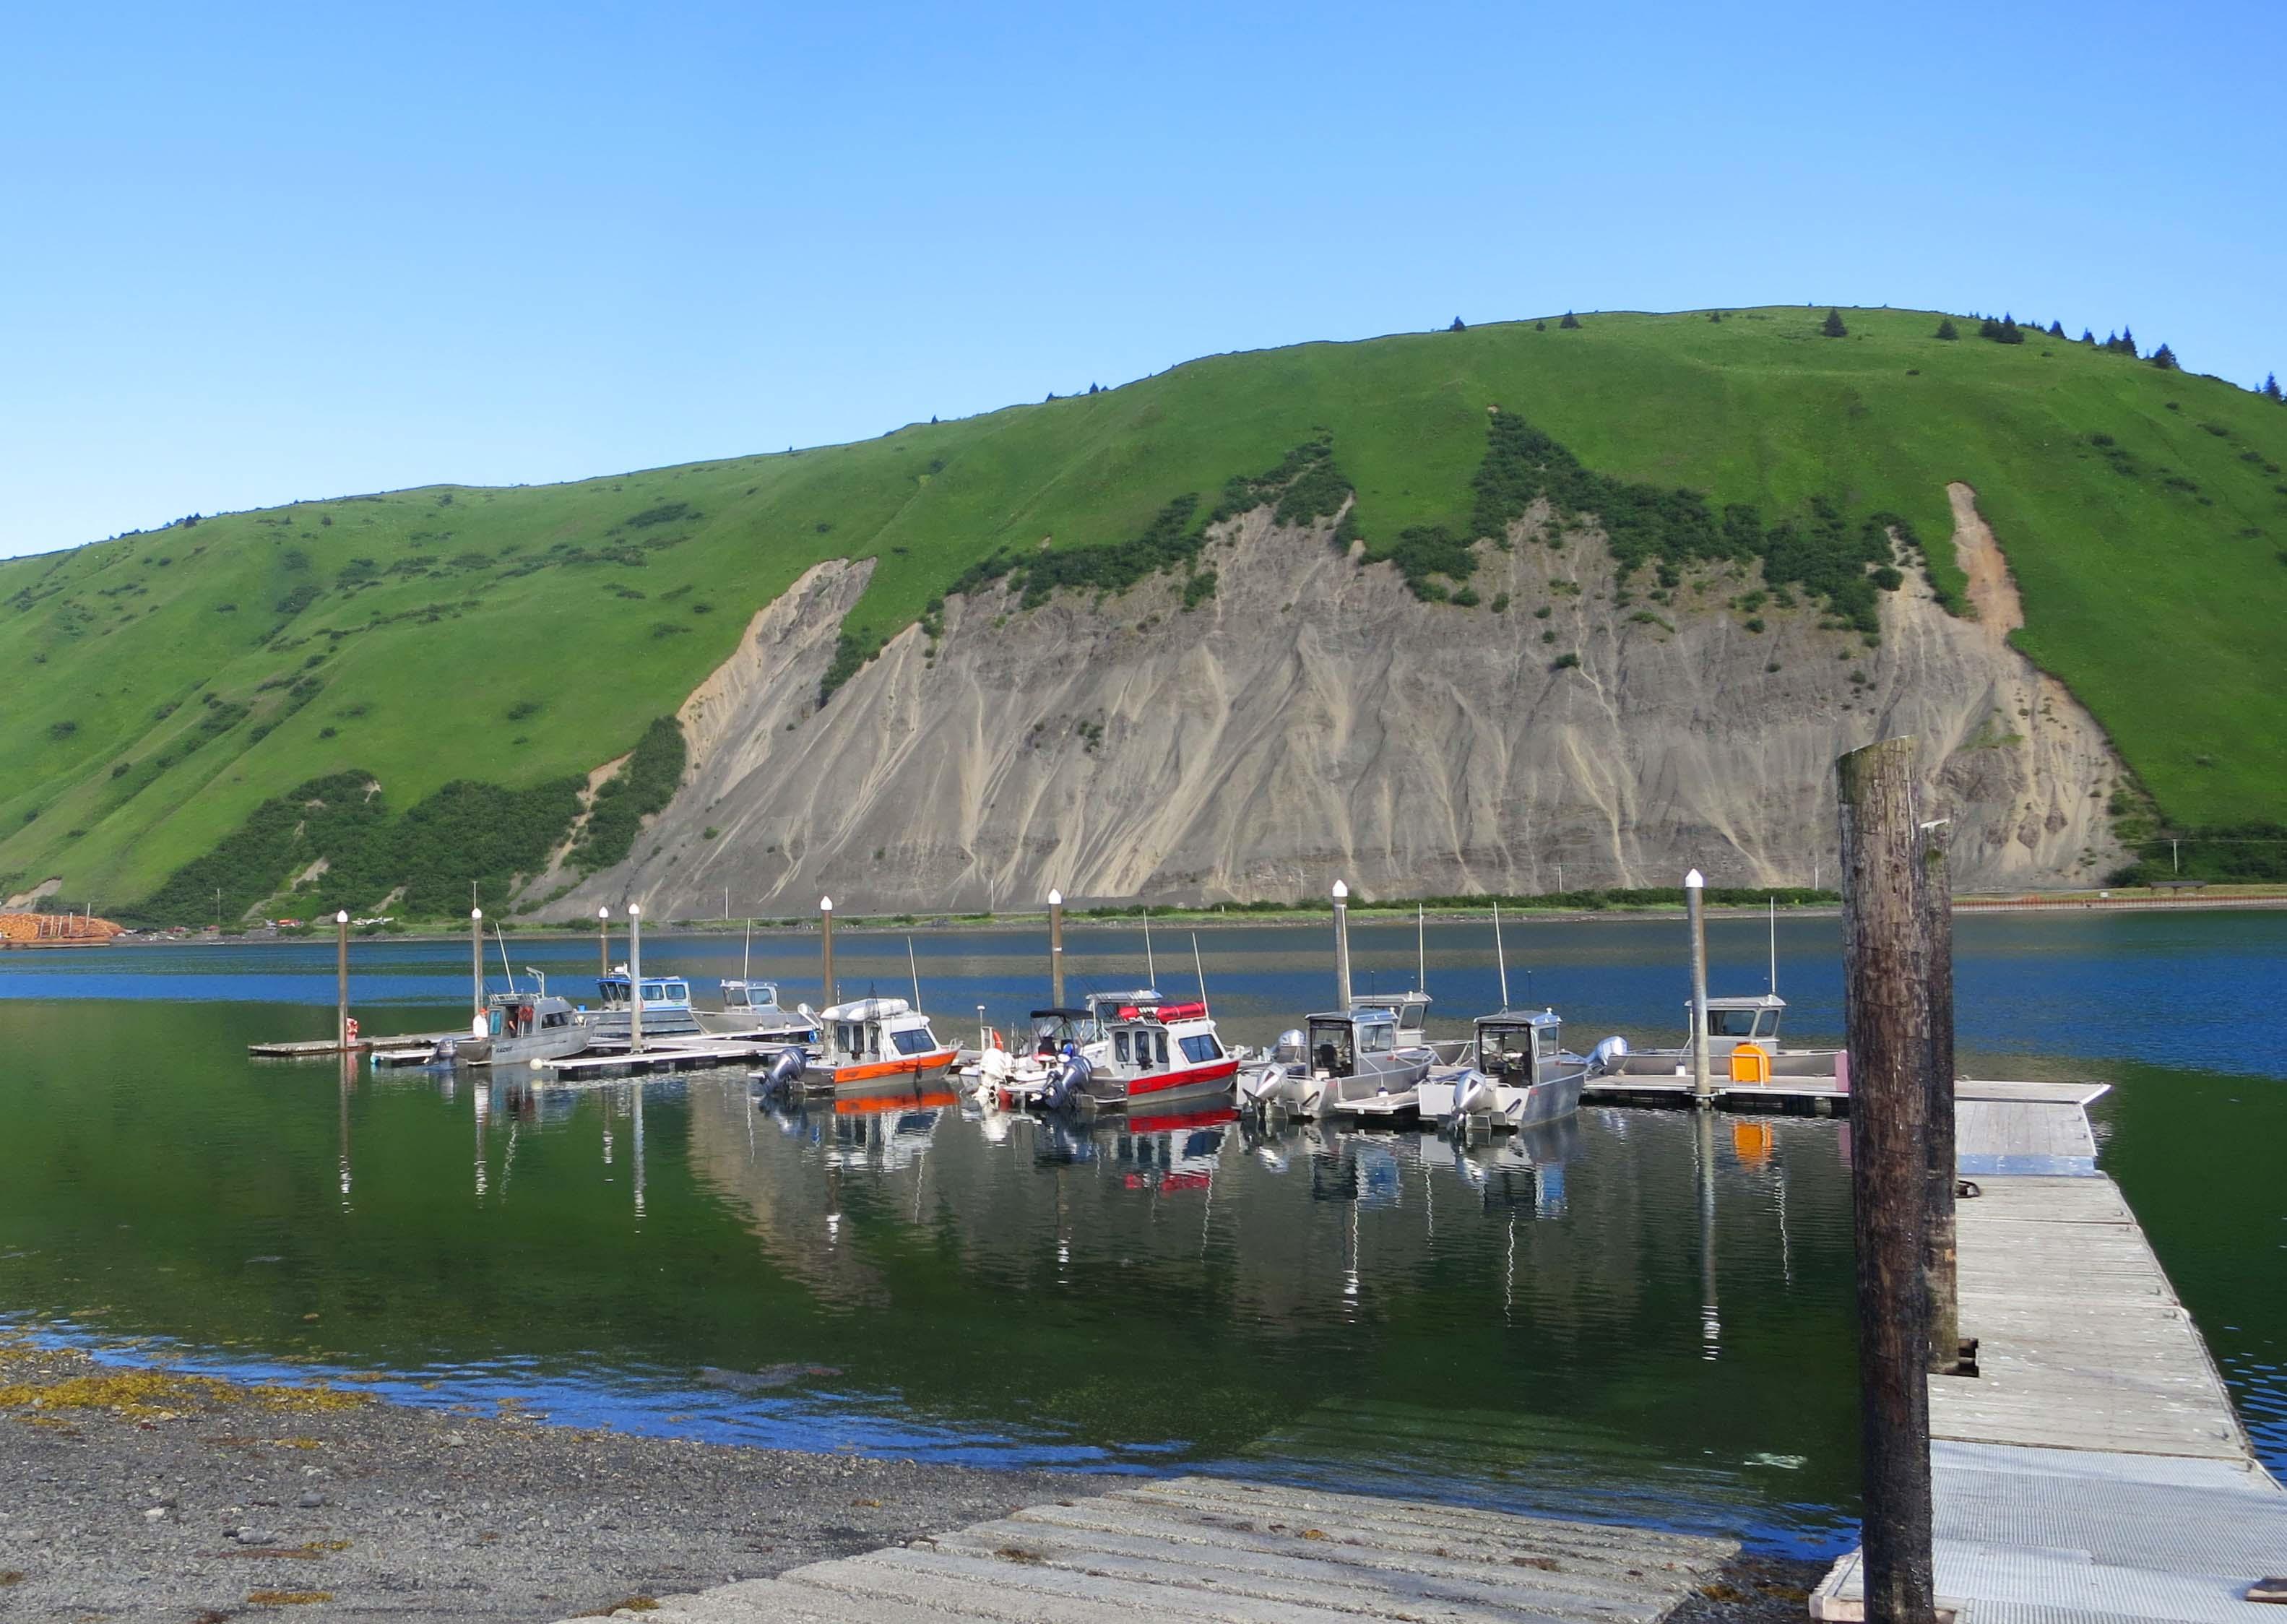 Coast Guard Kodiak has a dock for small fishing boats on base  and makes rental boats available for Coasties. (Members of the Coast Guard)